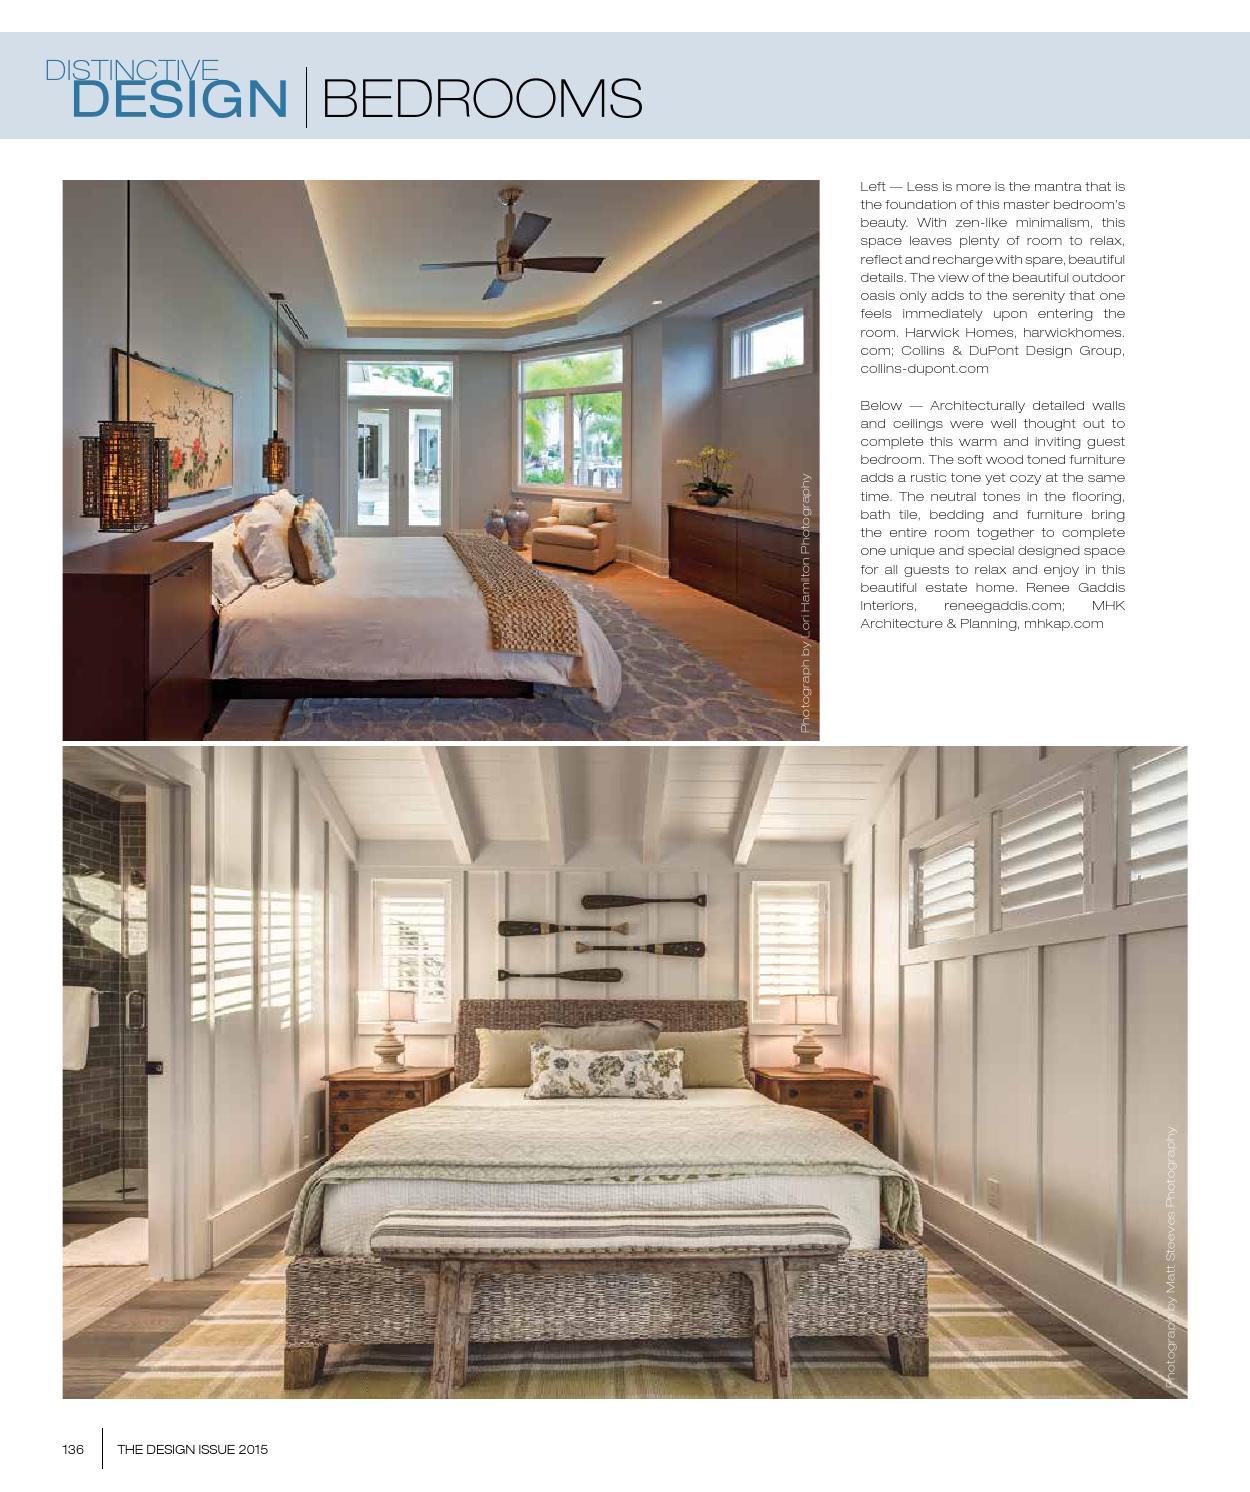 Collins & Dupont Design Group home & design magazine | design issue 2015 | southwest